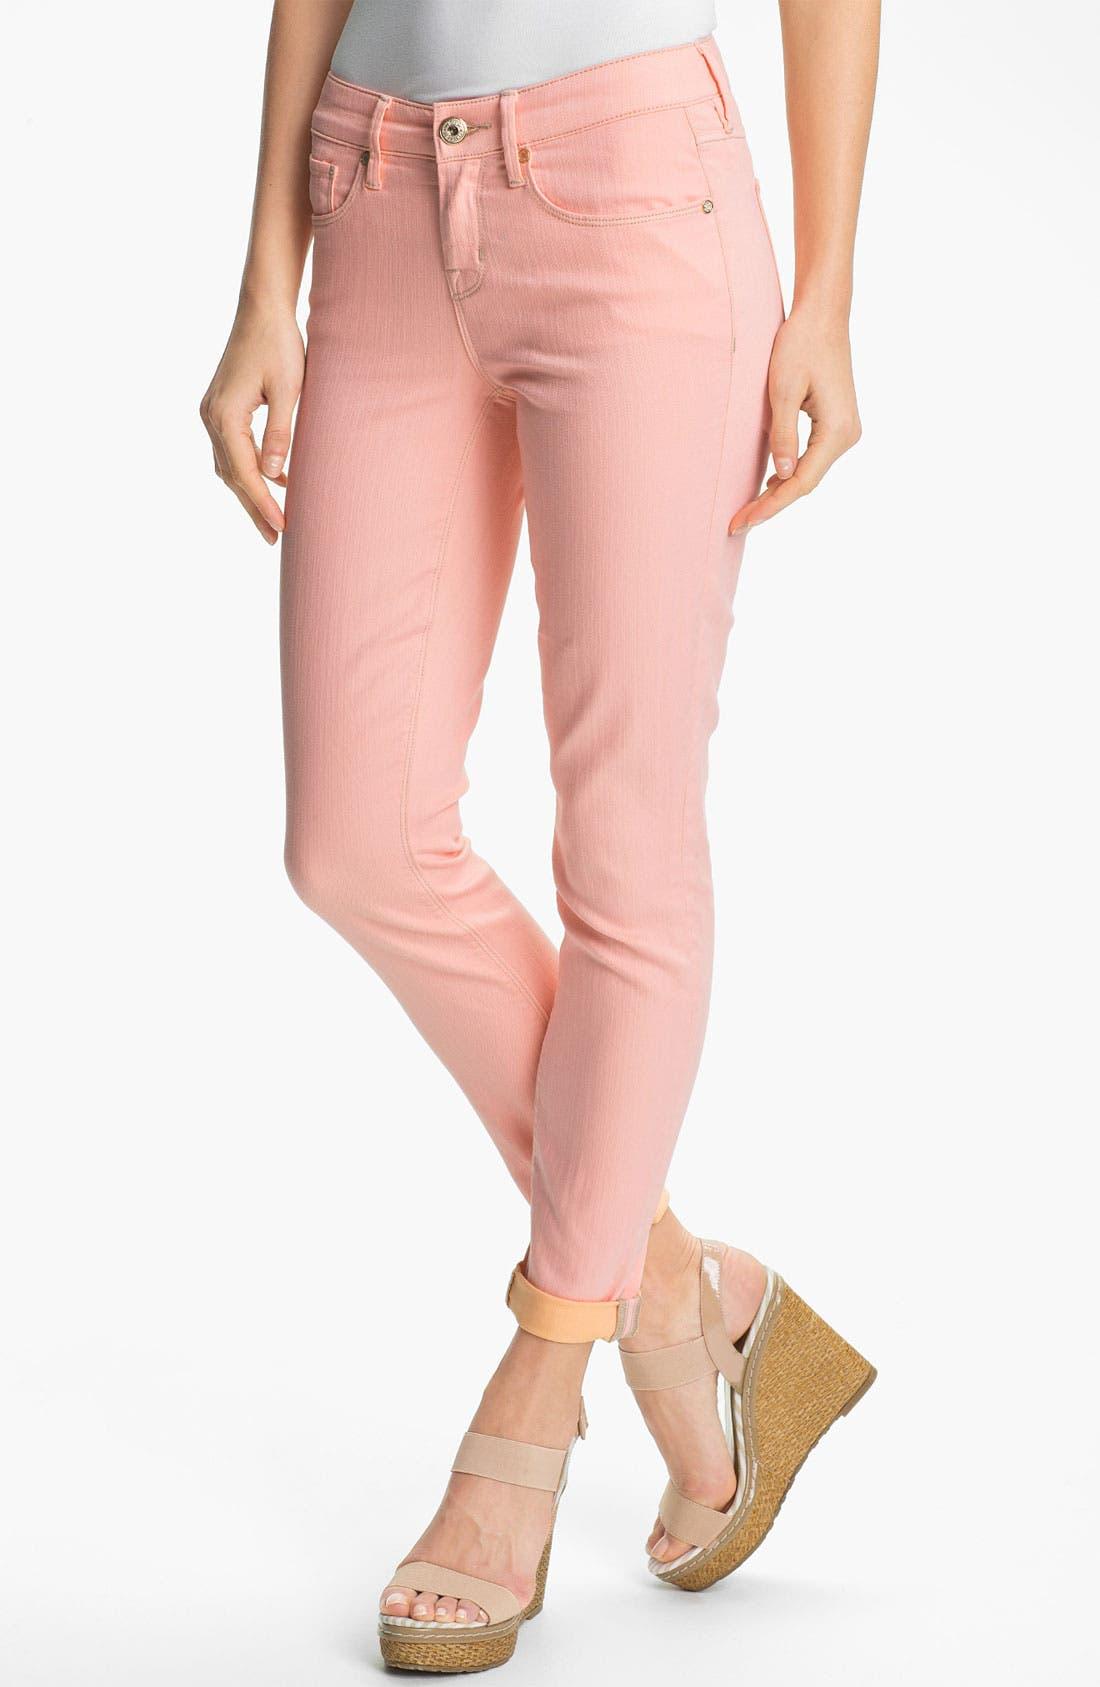 Main Image - Isaac Mizrahi Jeans Contrast Cuff Jeans